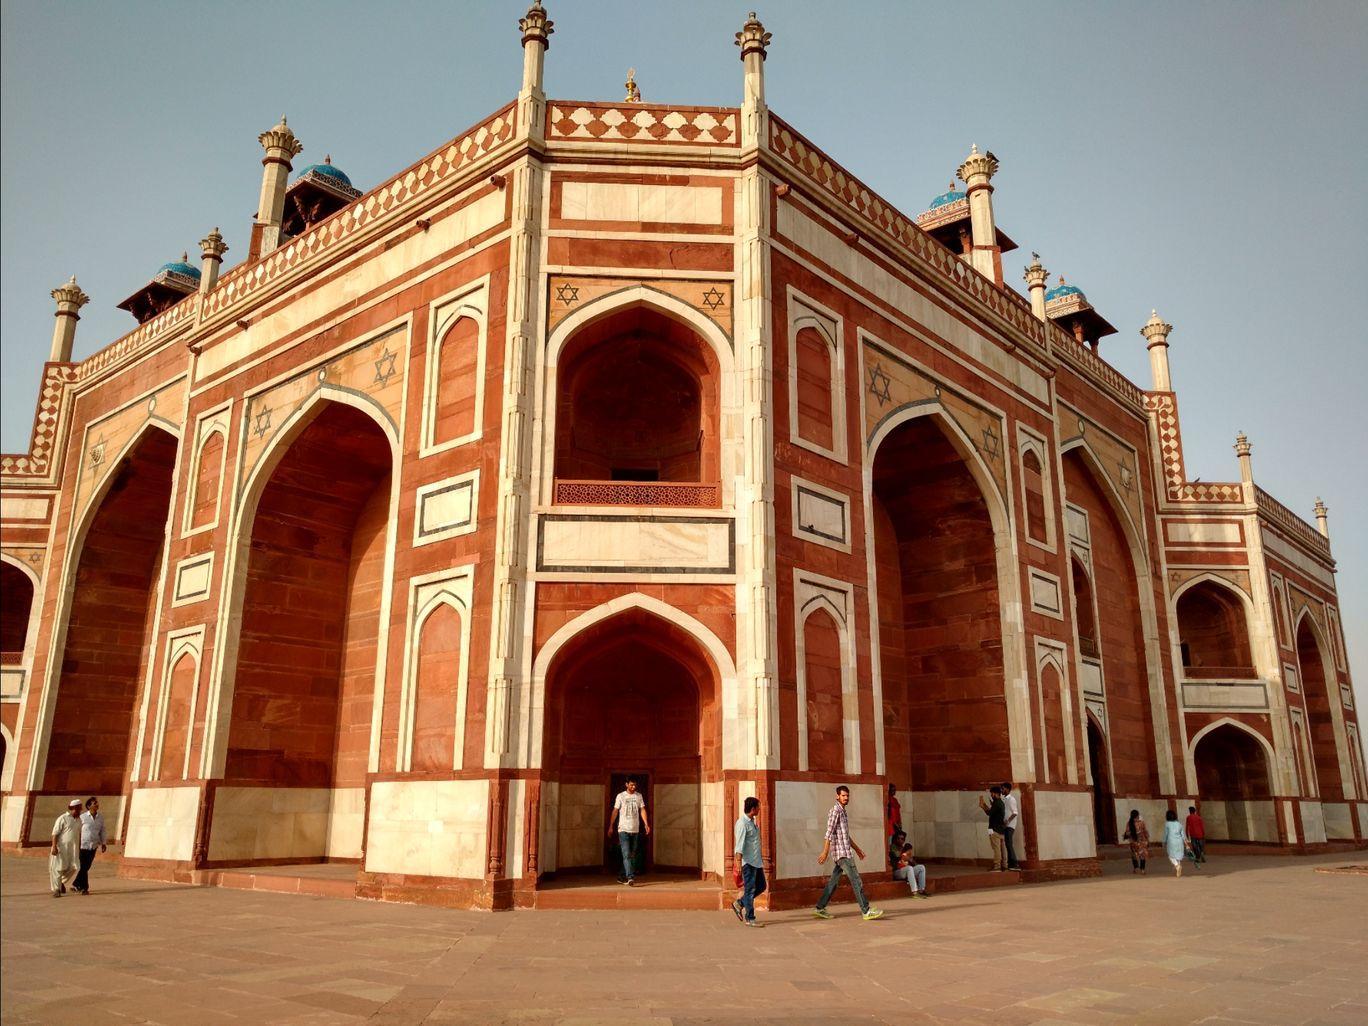 Photo of Humayun's Tomb By HEMANT PHULWARI